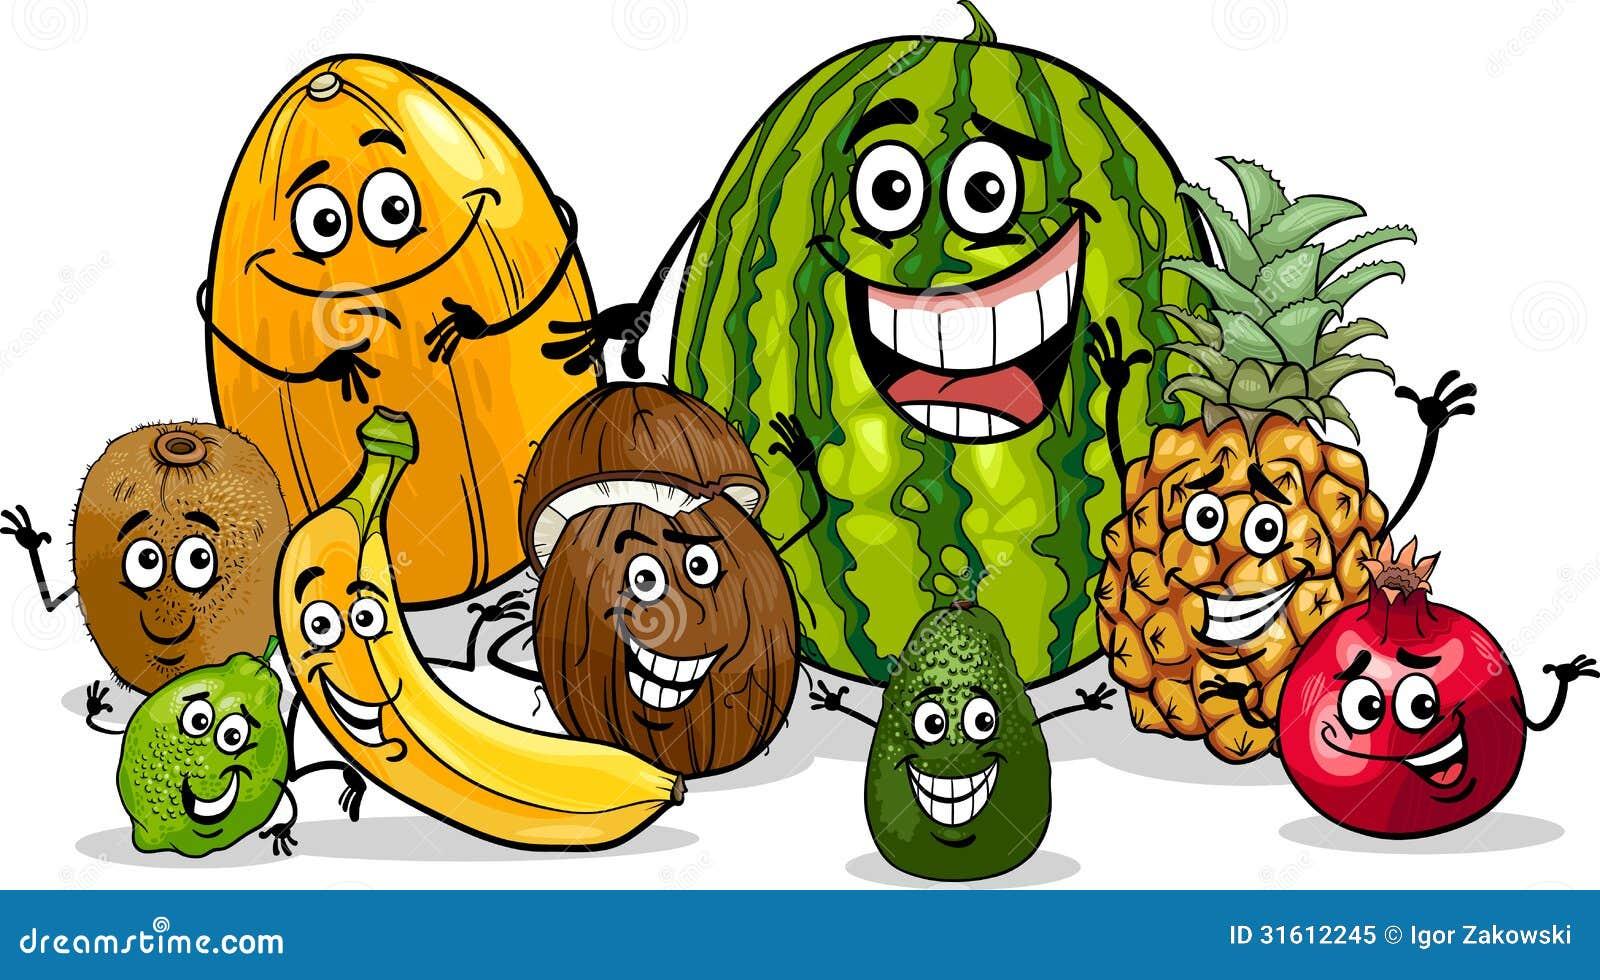 Funny Fruit Cartoons | www.pixshark.com - Images Galleries ...